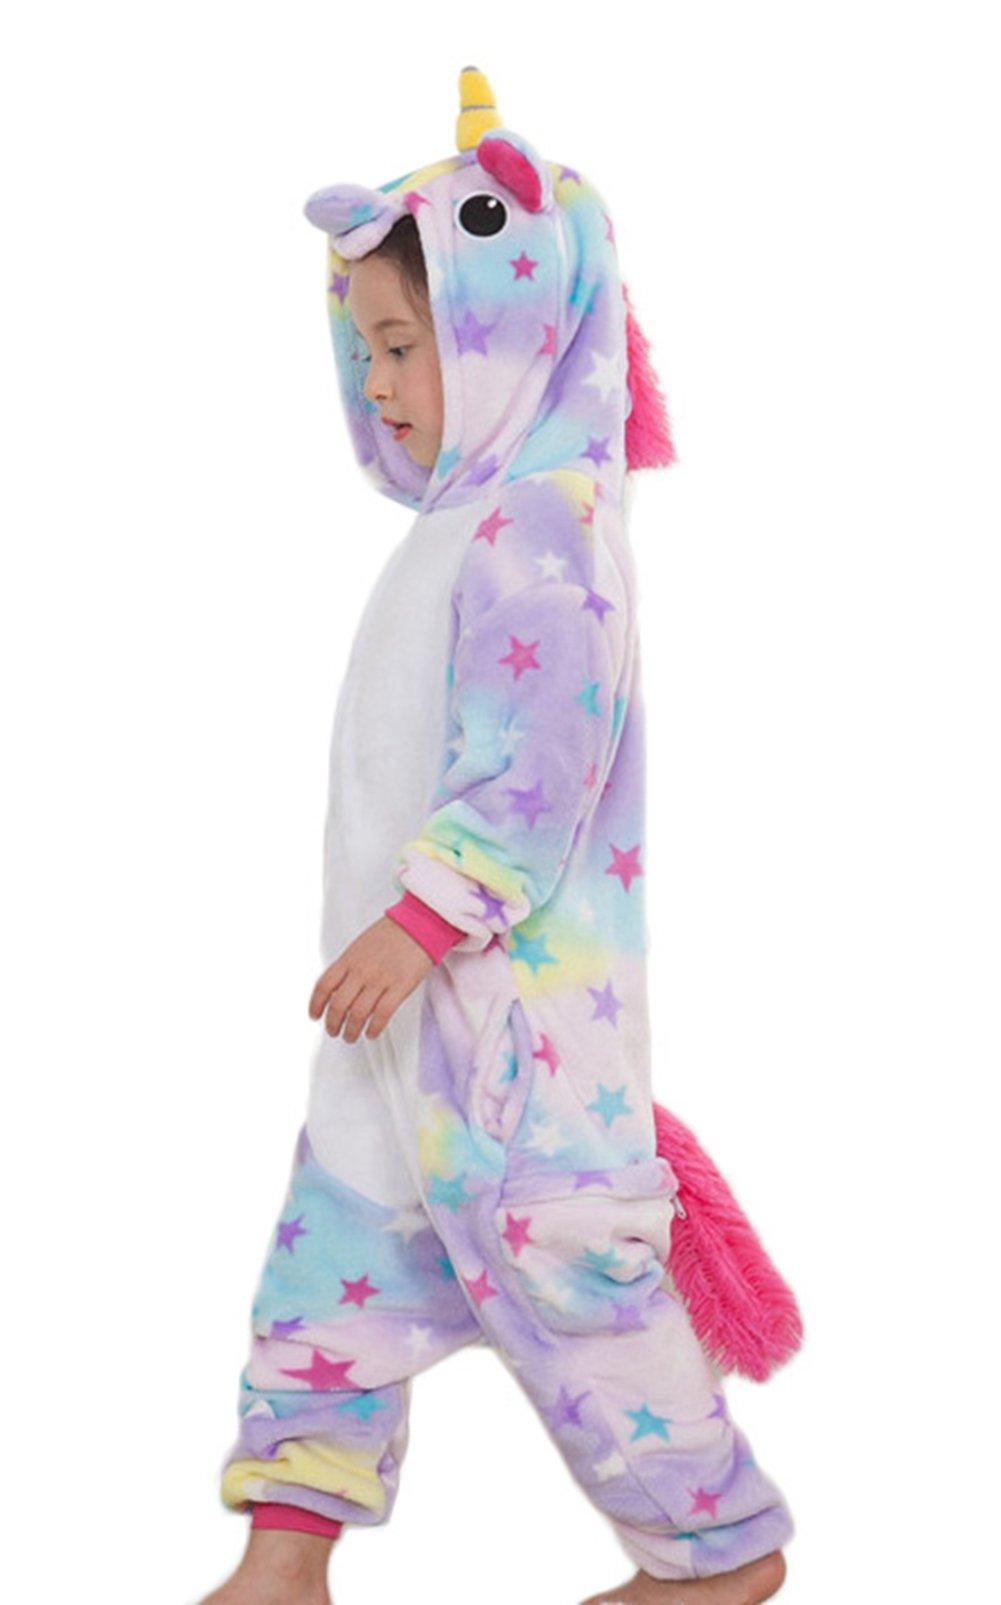 EcoOnesie Girls Animal Onesie Halloween Cartoon Costume One Piece Unicorn Pajamas Anime Cosplay Lounge Wear Outfits Kids Size 10